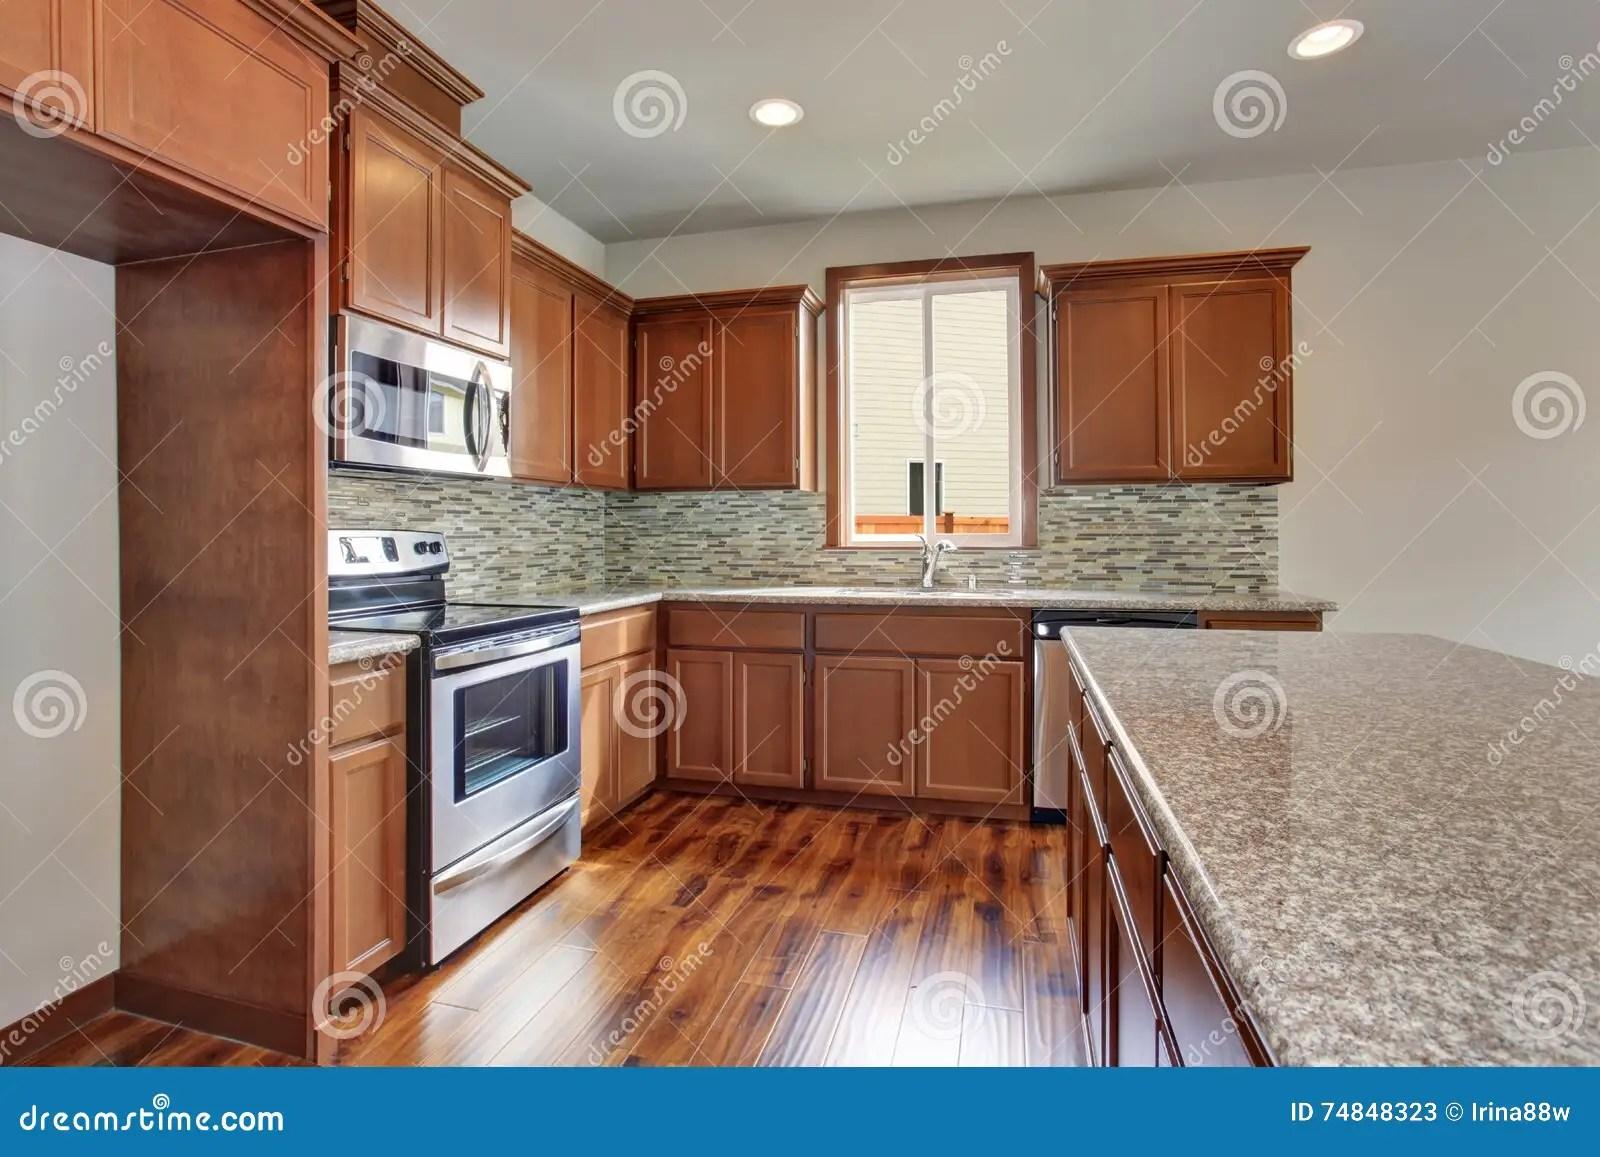 brown kitchen sink vigo faucet 有棕色内阁 花岗岩桌面和硬木地板的现代厨房室库存图片 图片包括有不锈 花岗岩桌面 不锈钢装置和硬木地板的现代厨房室